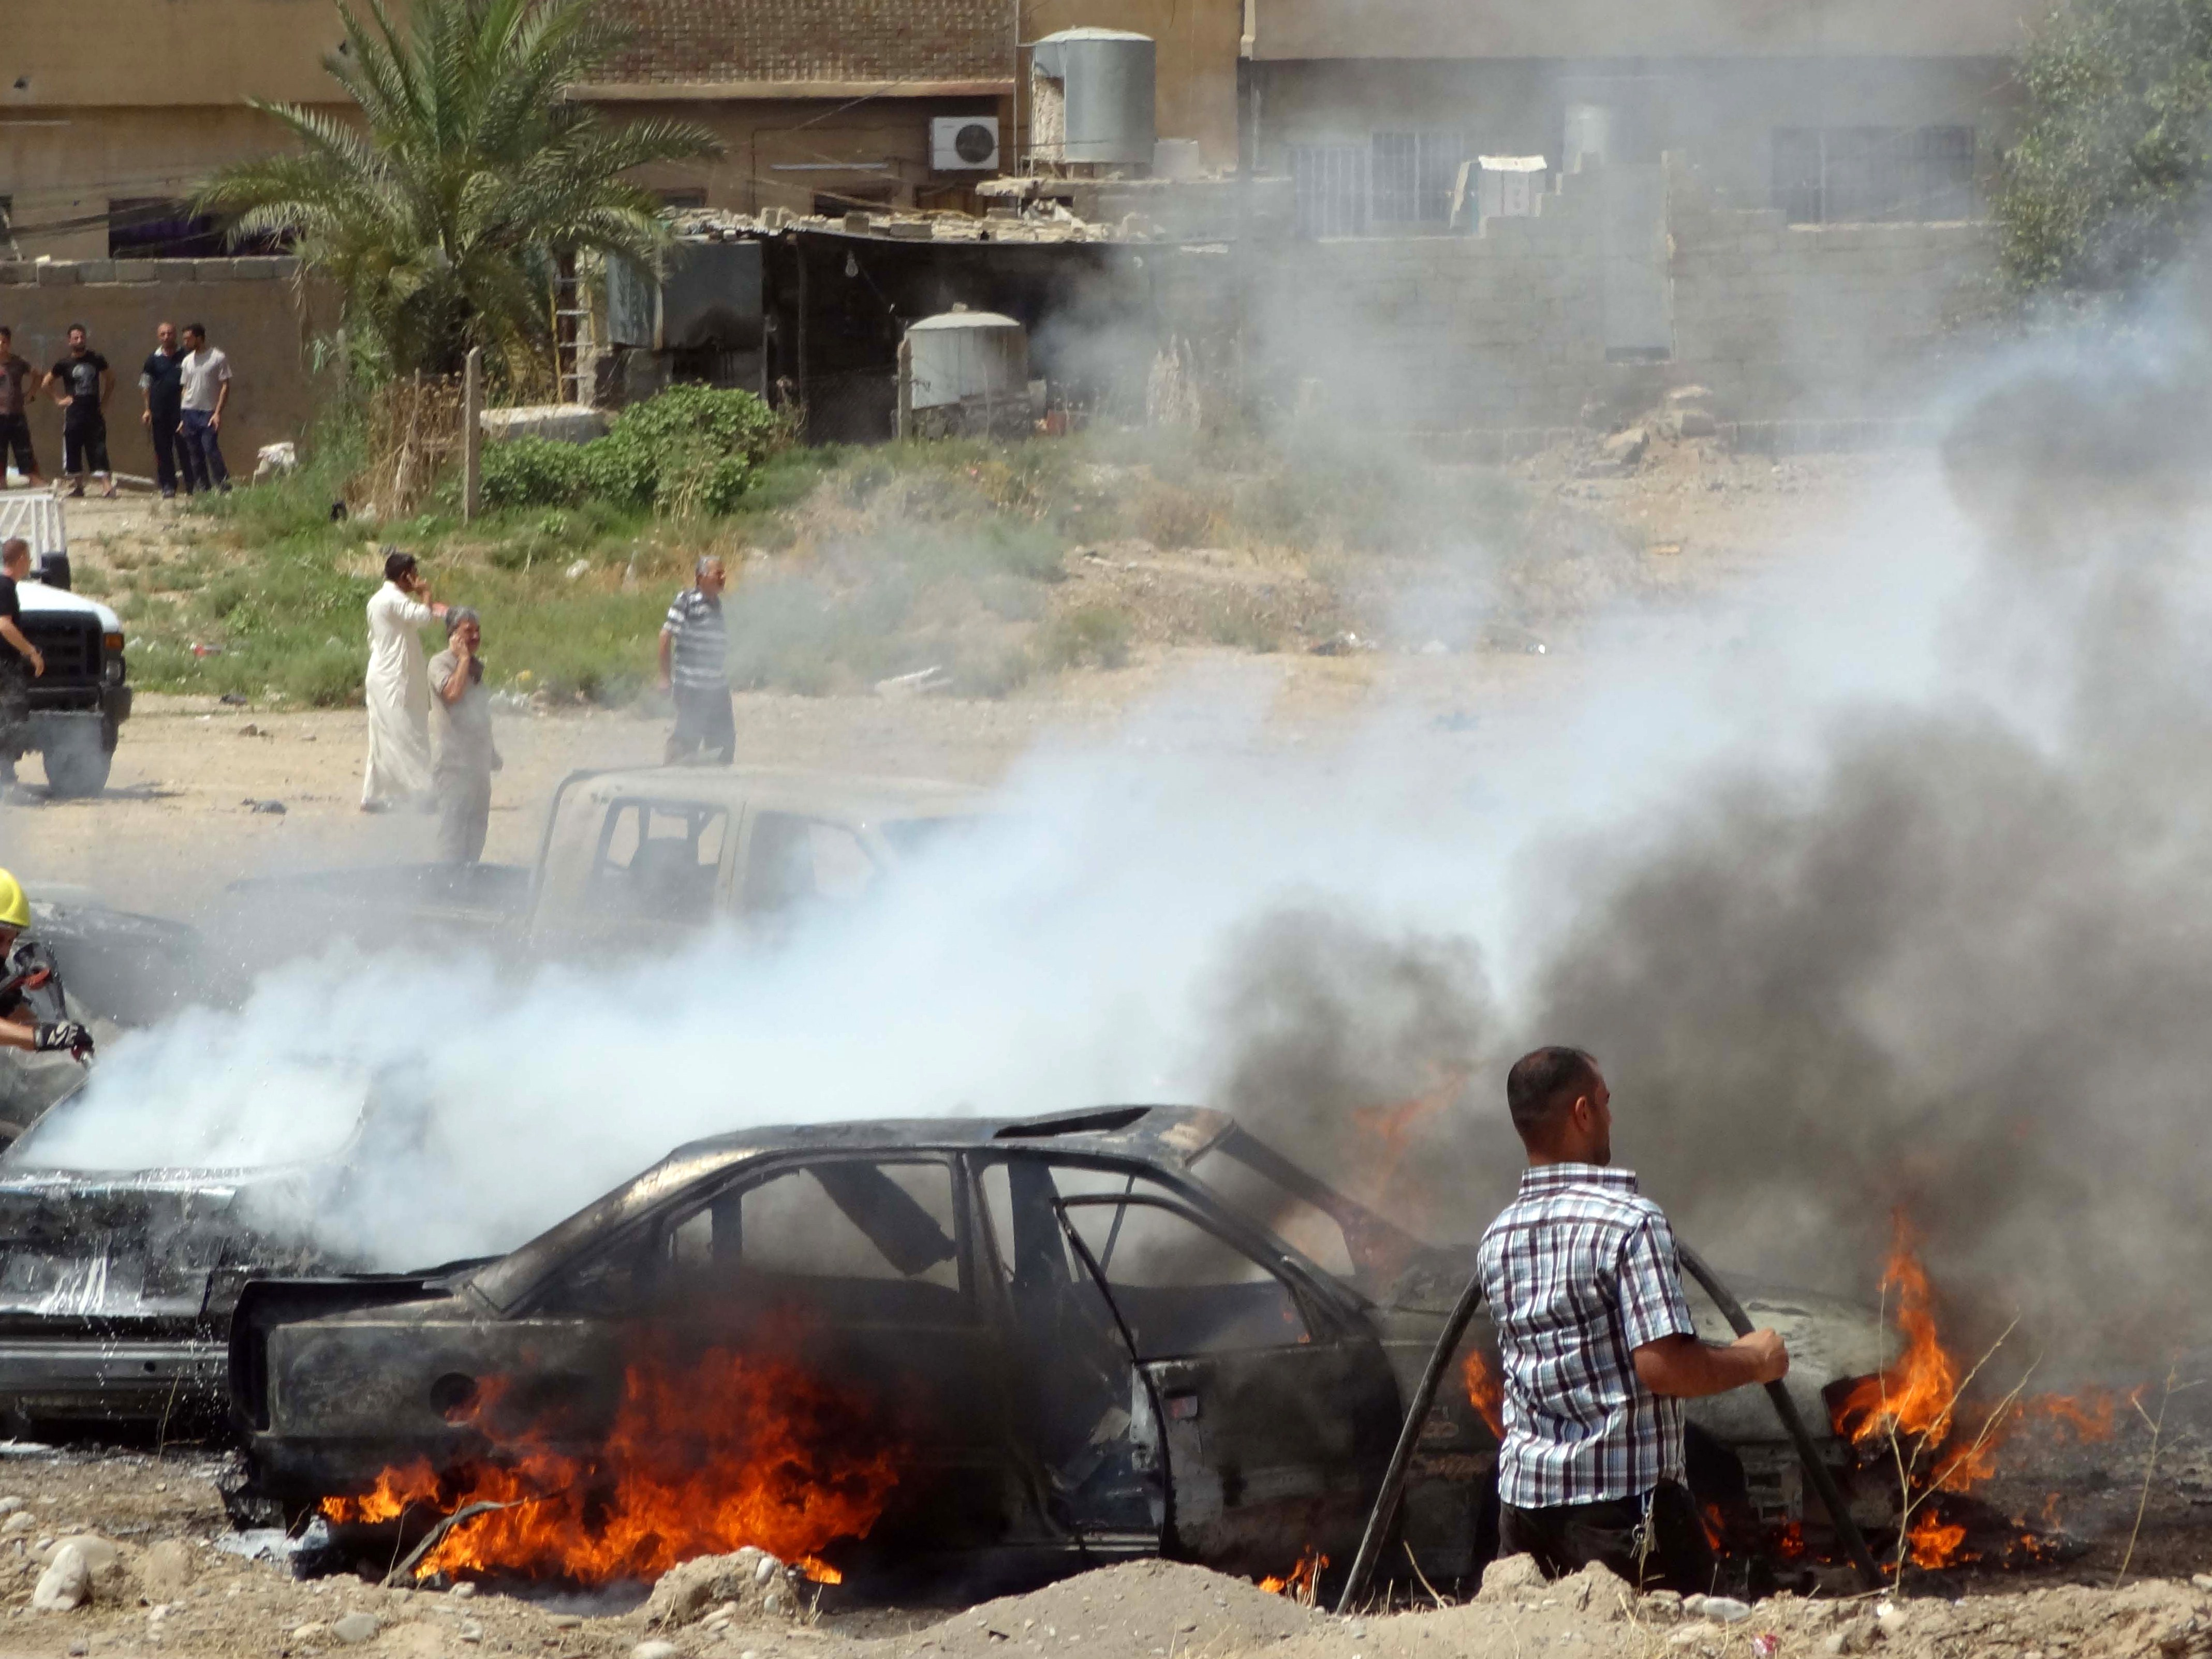 The aftermath of a car bombing in Kirkuk, the capital of Iraqi Kurdistan. MARWAN IBRAHIM/AFP/Getty Images